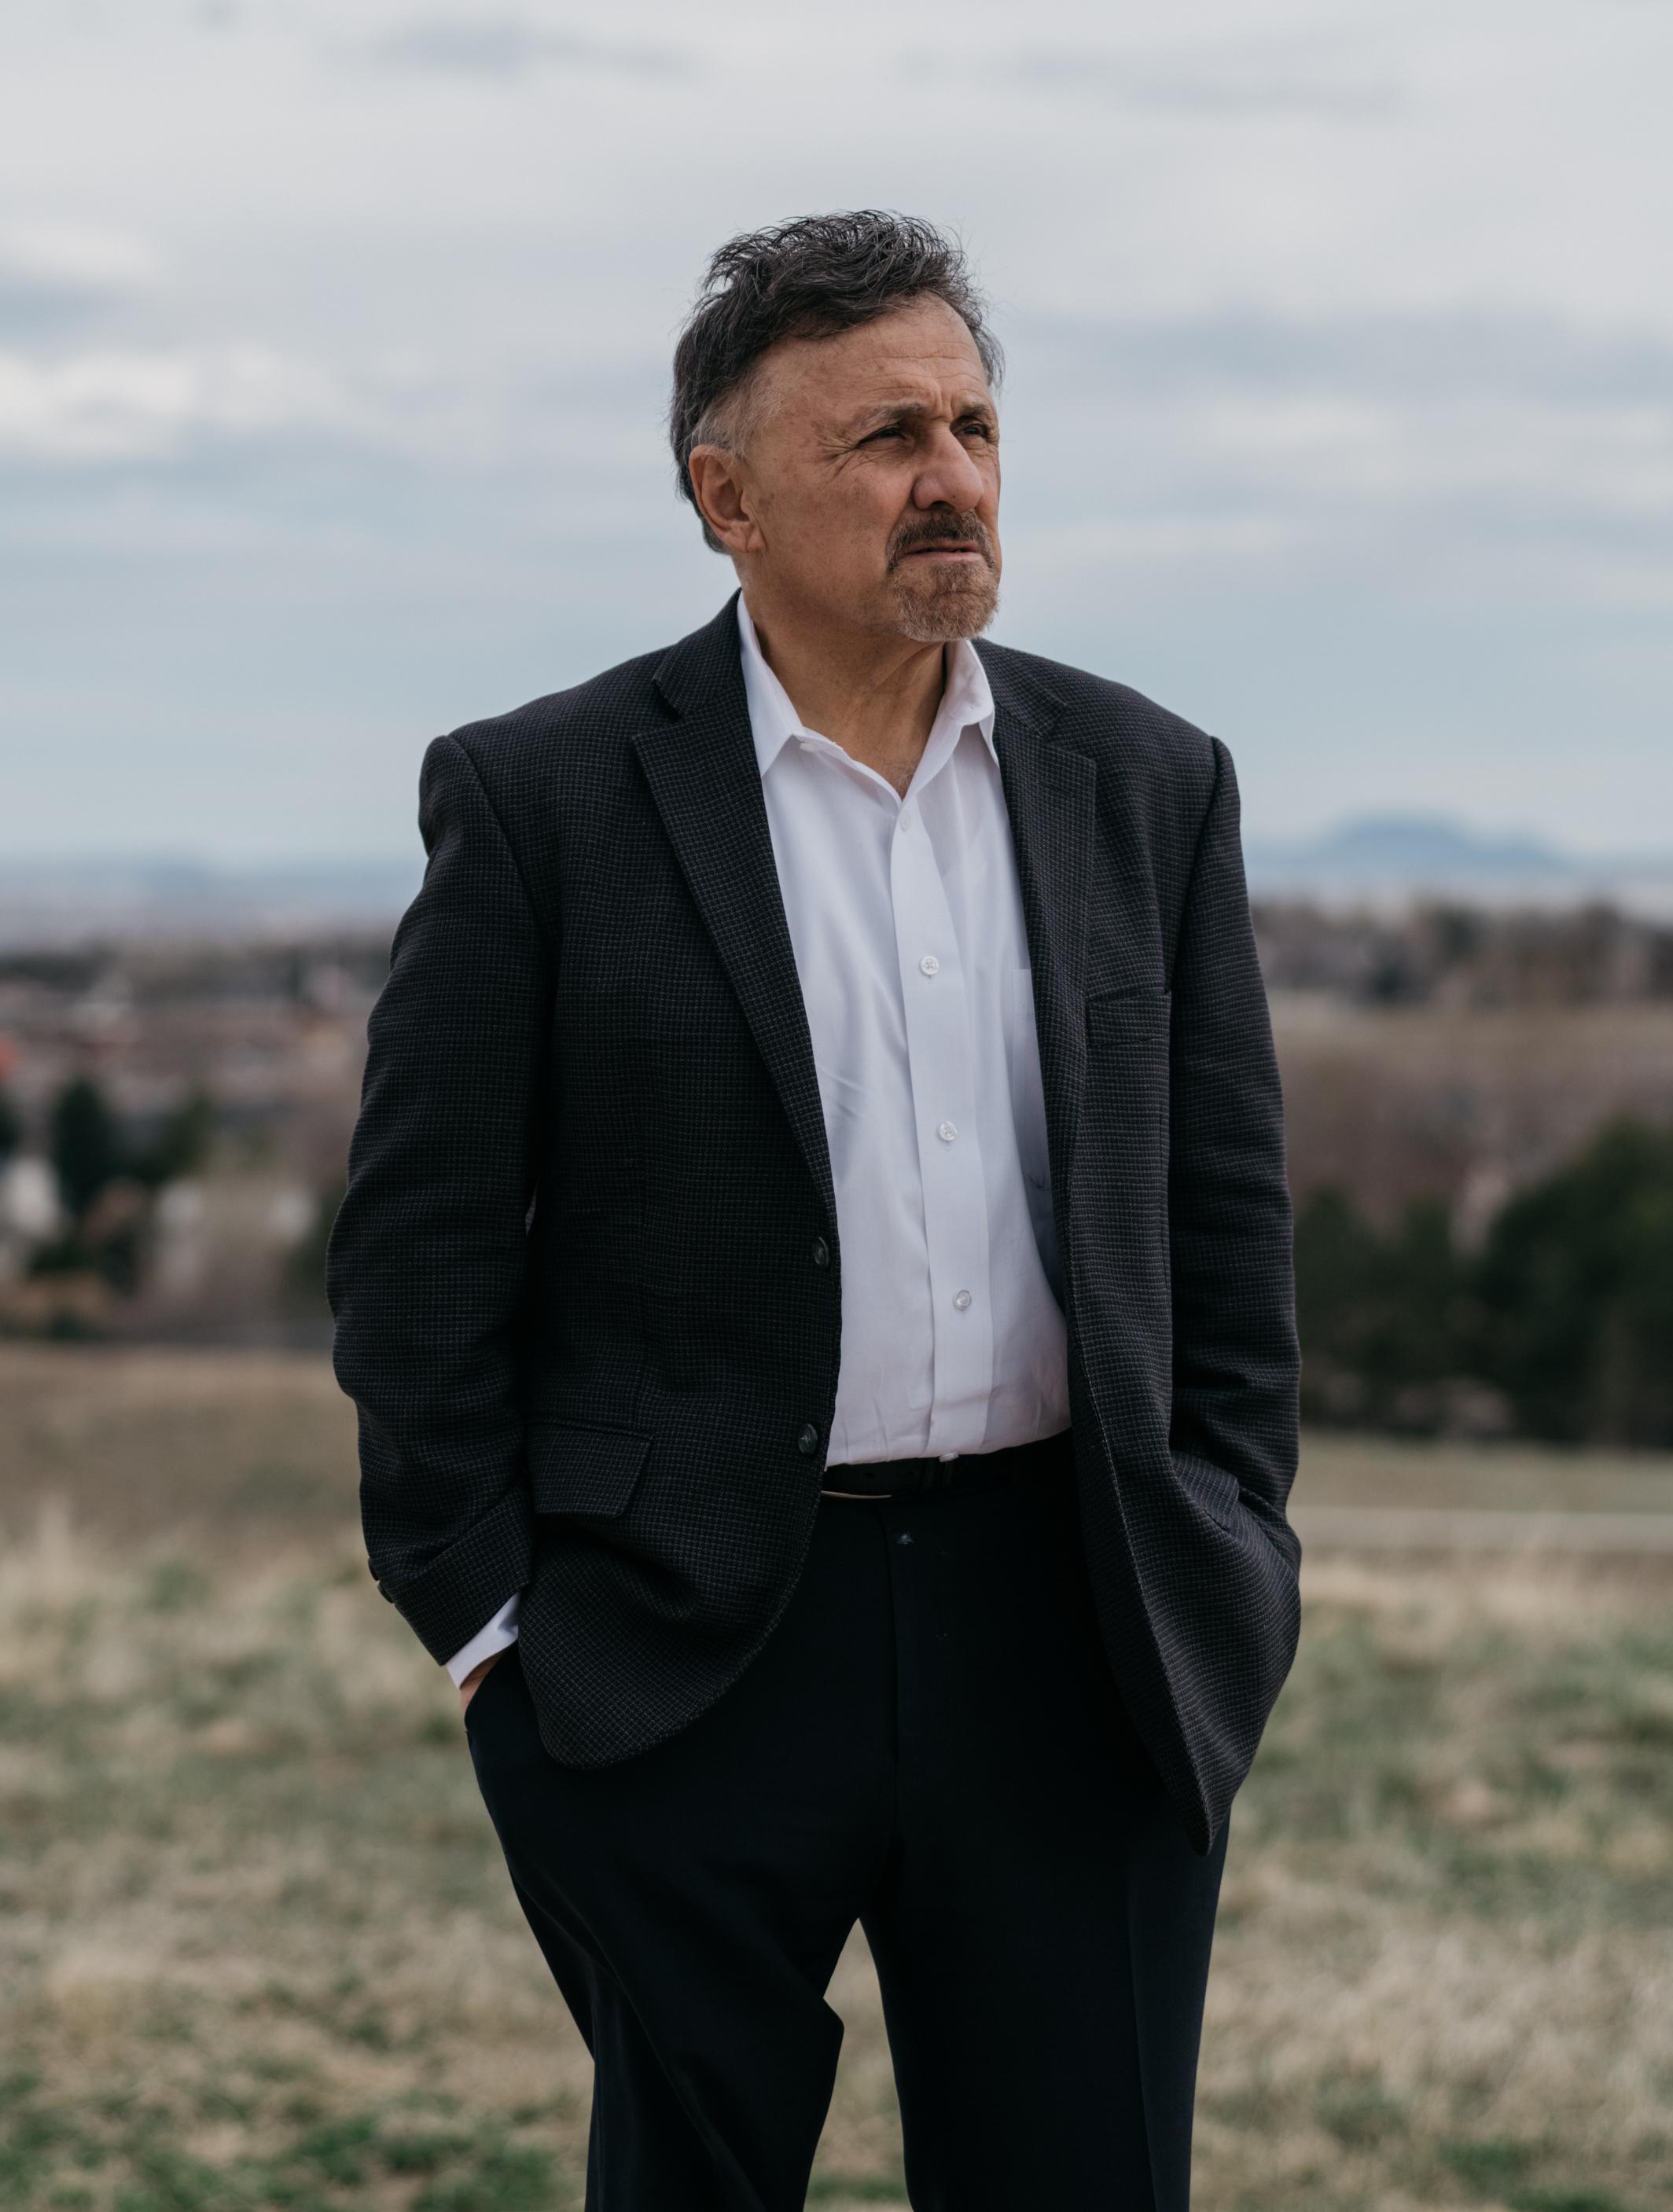 'It's just America': Columbine's former principal on gun control and trauma